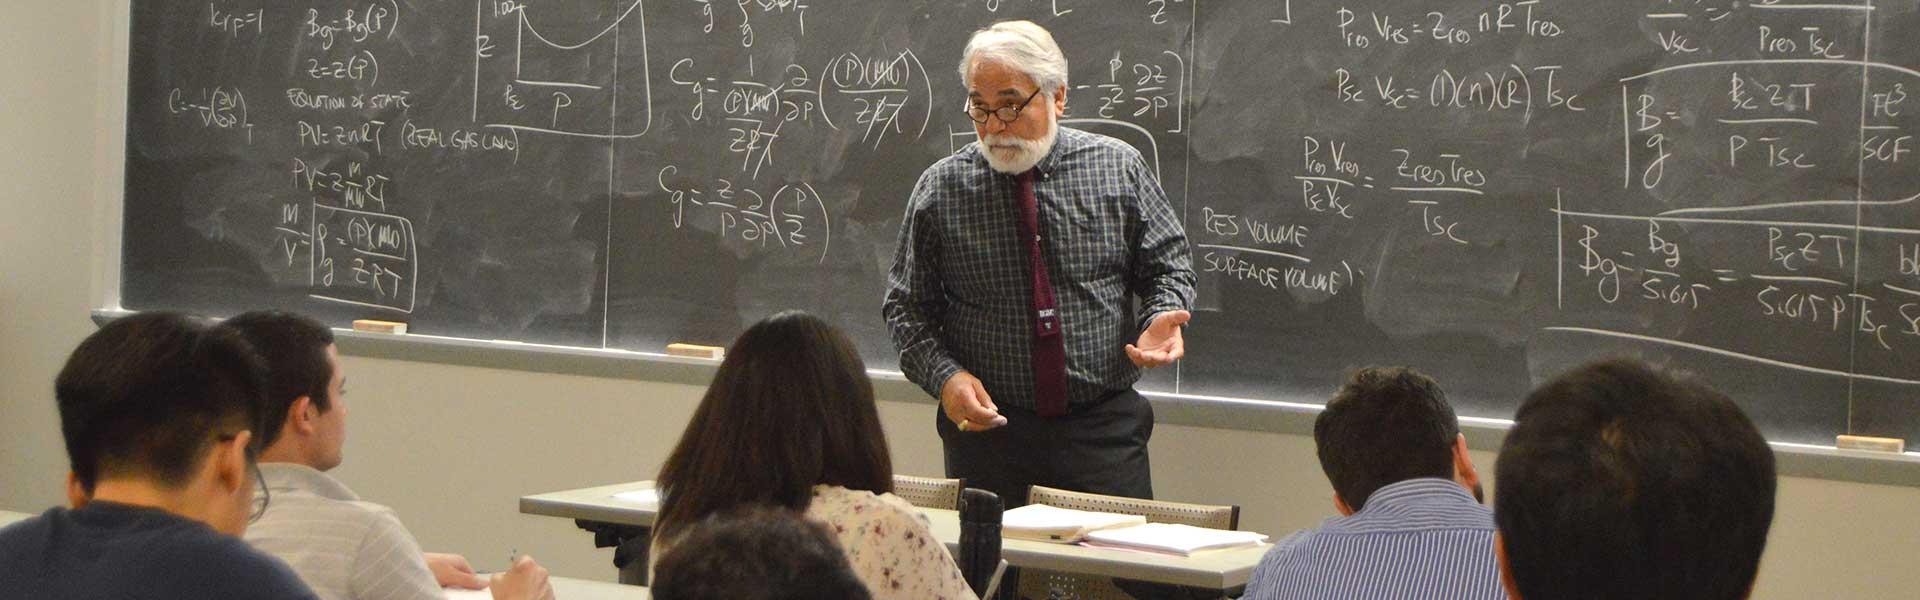 Turgay Teaching